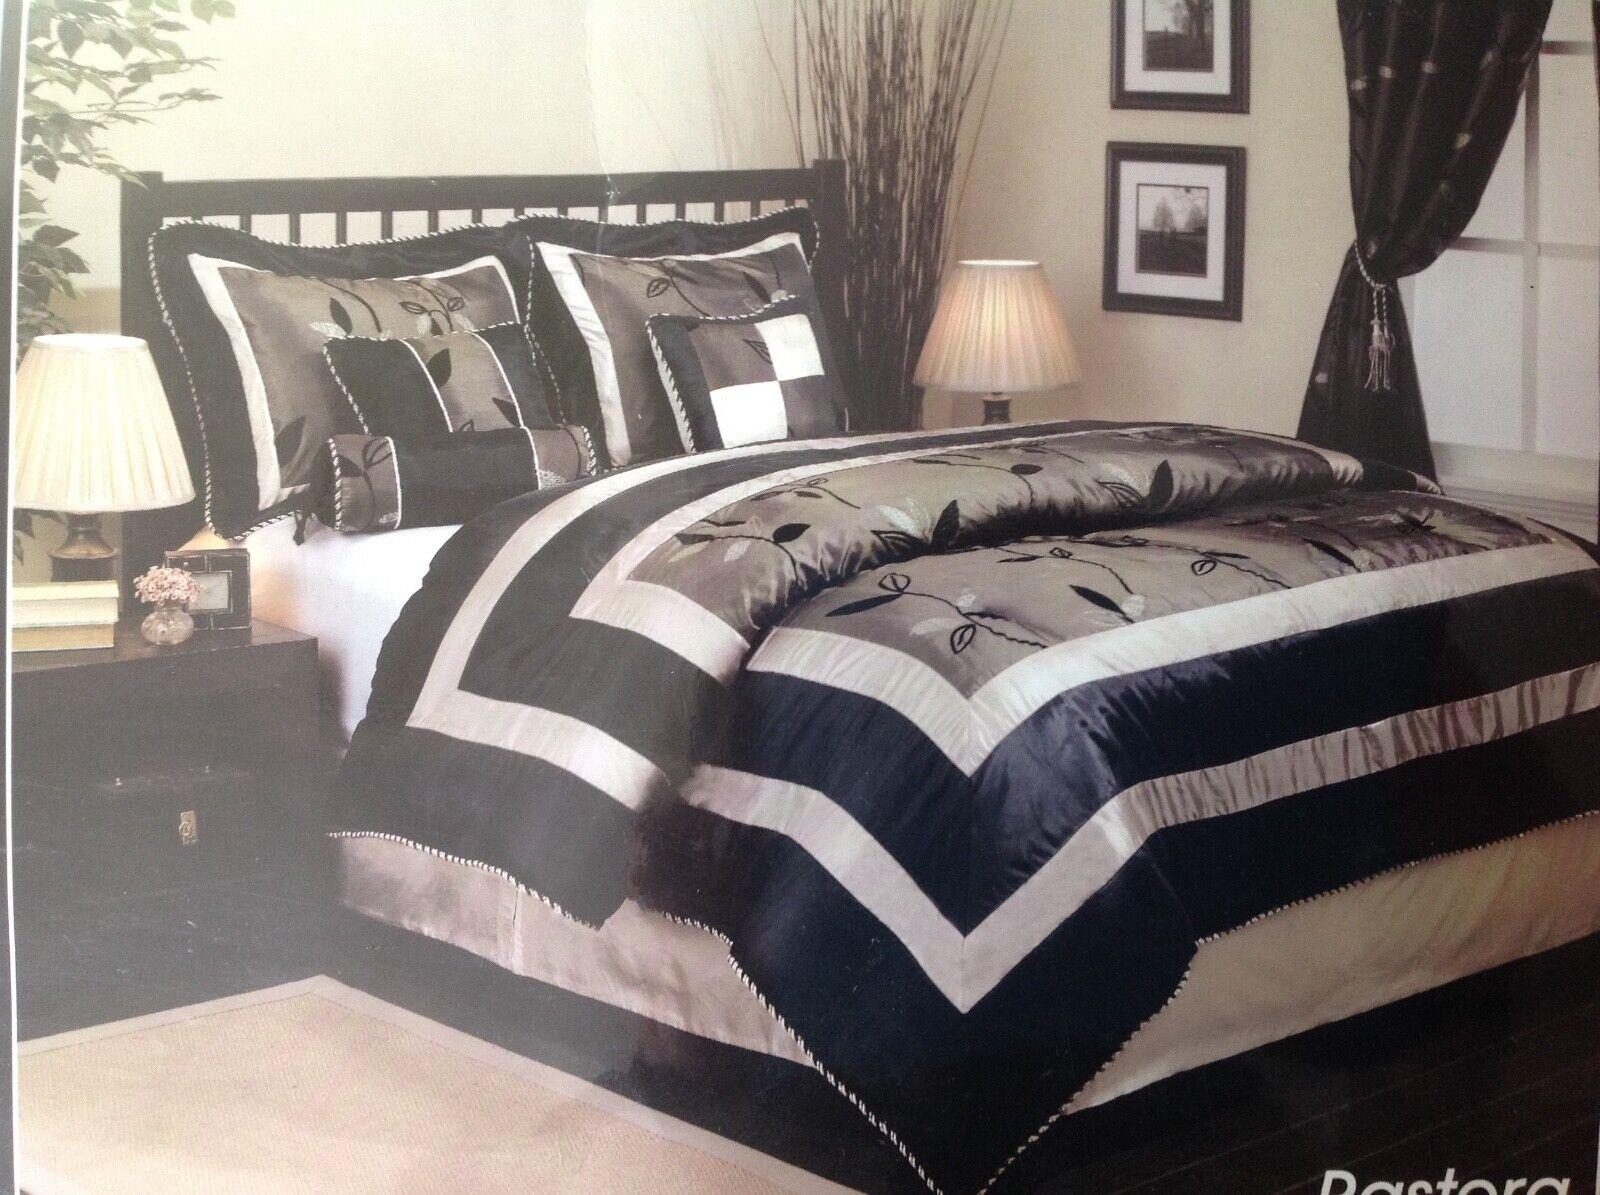 Nanshing PASTORA7-Q Pastora Collection Bedroom Comforter Com